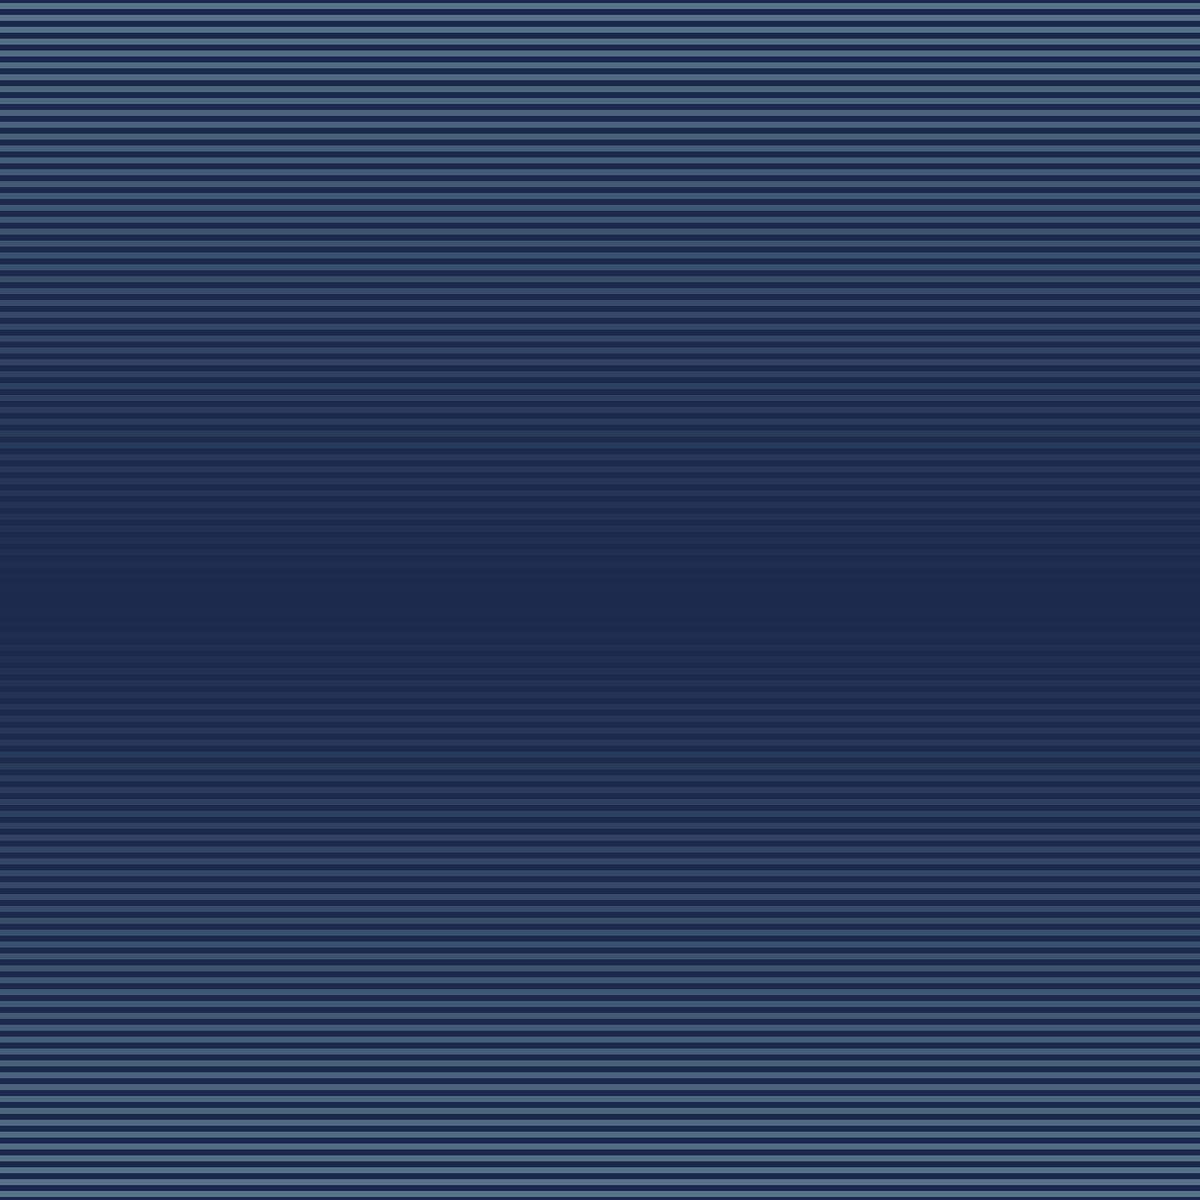 Inspiration fietsmaat013 pattern